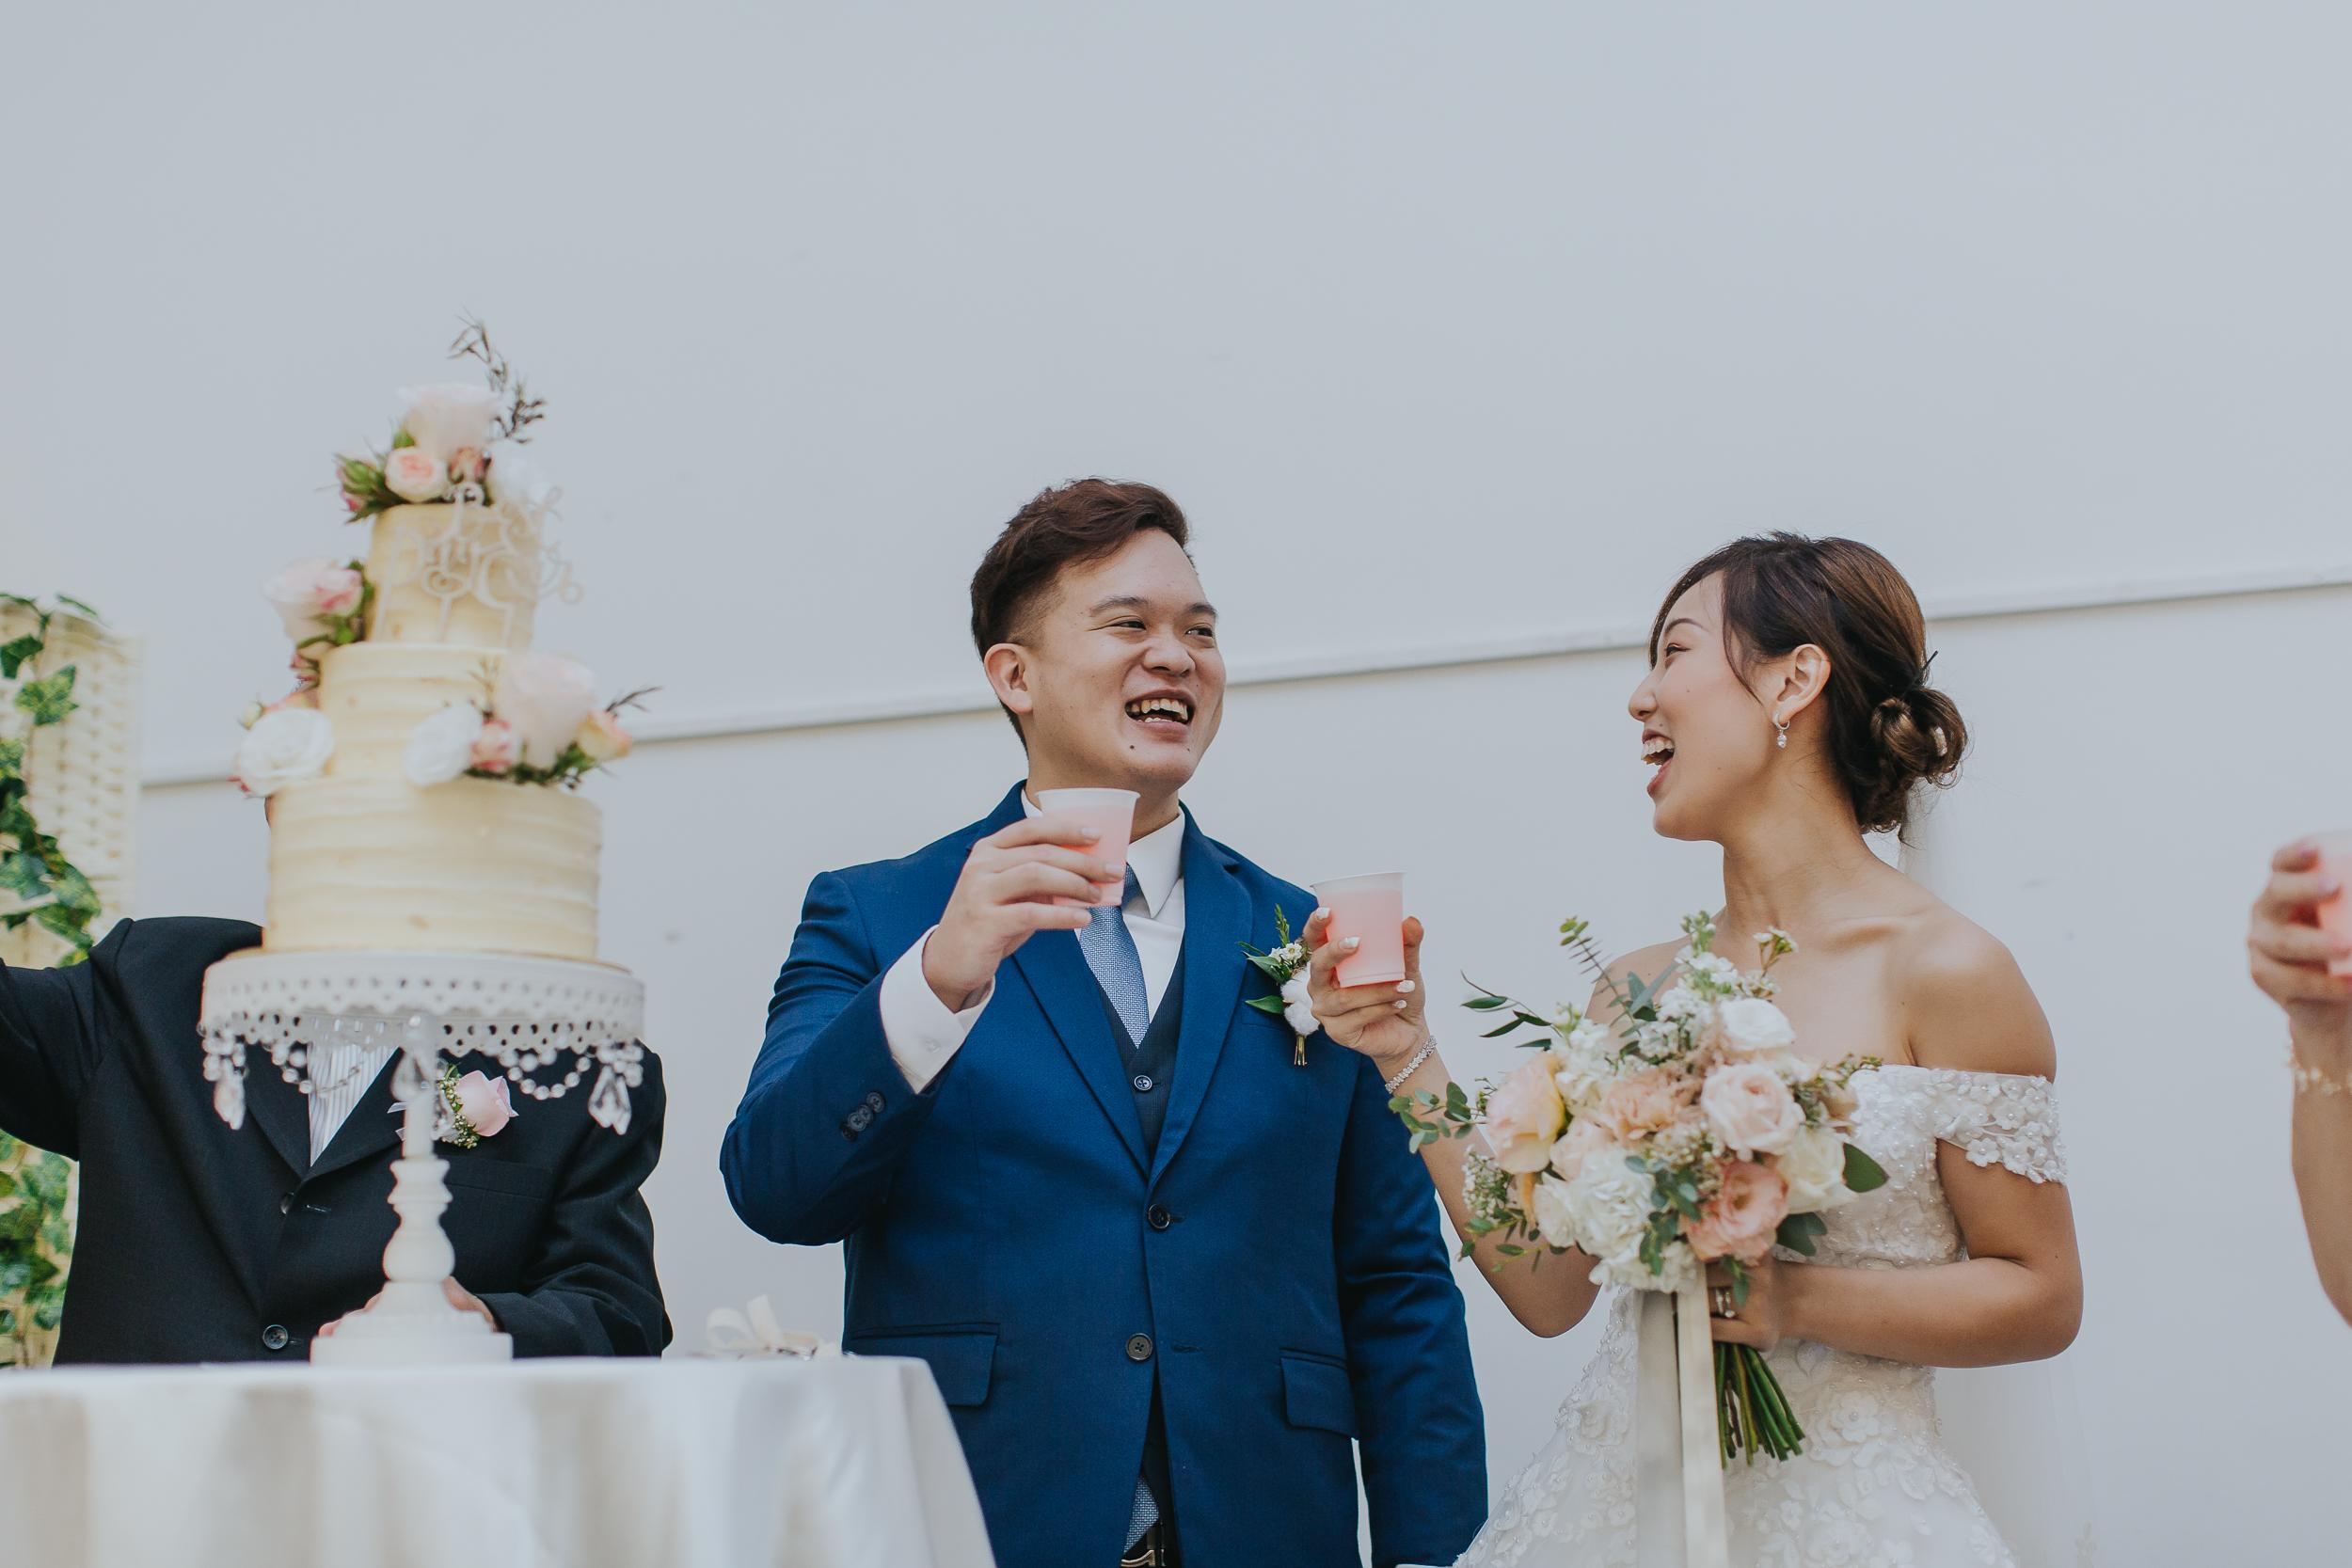 Singapore+Actual+Day+Wedding+Photographer+Grand+Mercure+Oliver+Estelle-0067.jpg